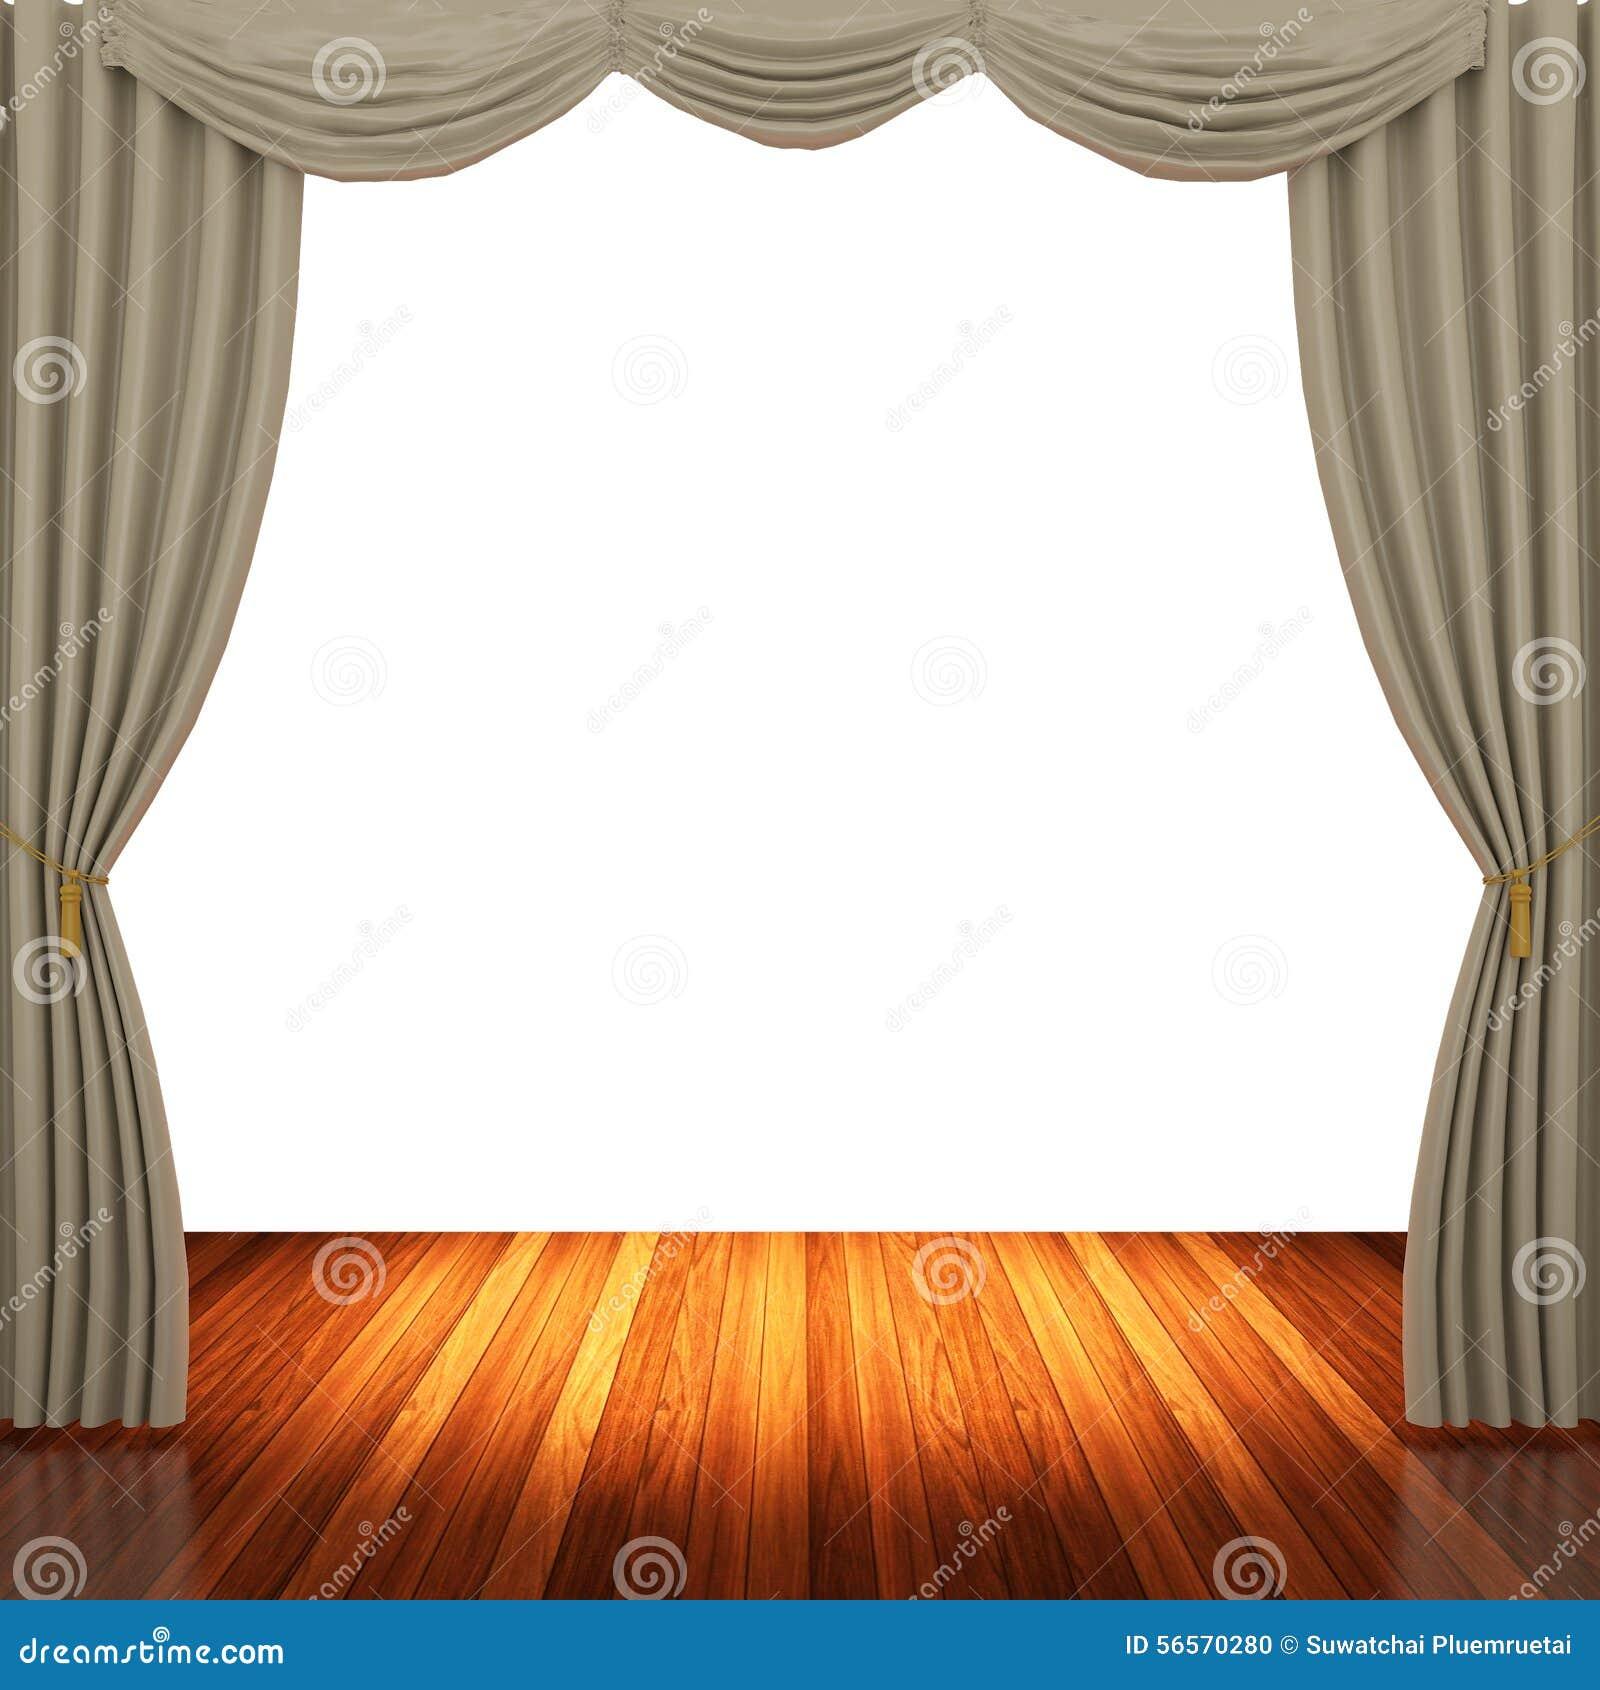 Download Στάδιο με τις ανοικτό καφέ κουρτίνες και το επίκεντρο Απεικόνιση αποθεμάτων - εικονογραφία από δραματικός, απόδοση: 56570280